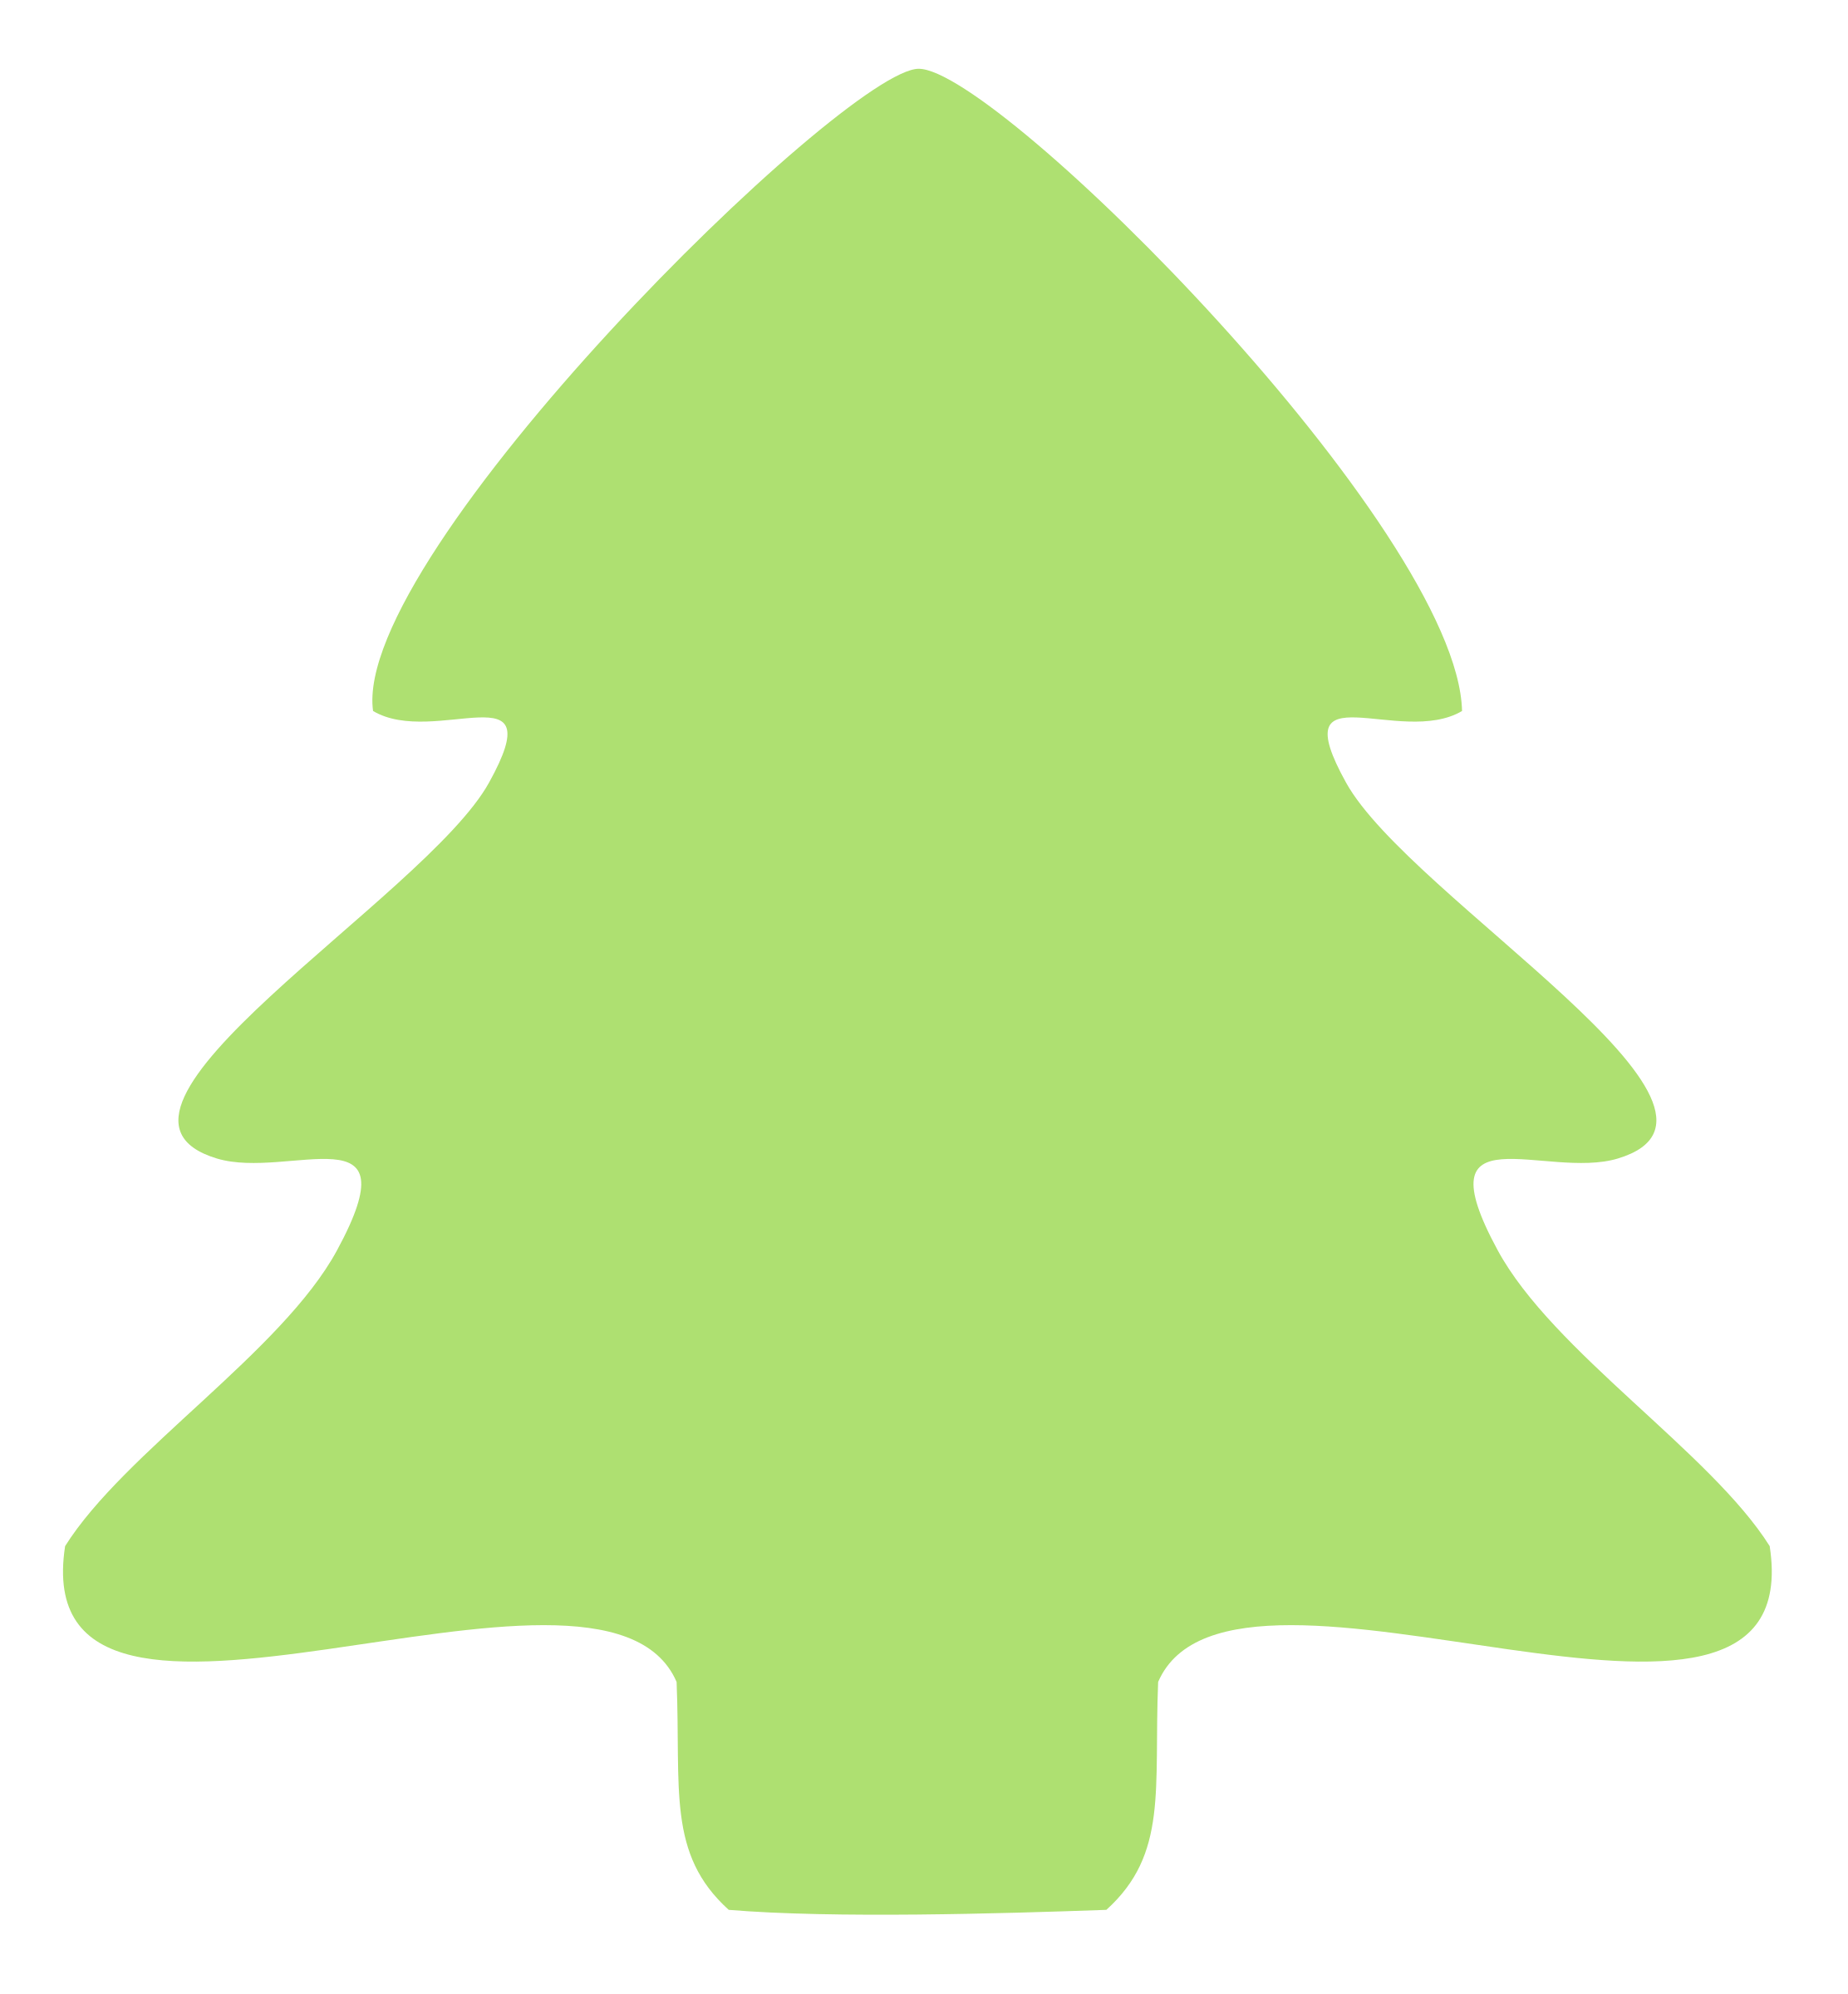 Leaves Clipart Christmas Tree Leaves Christmas Tree